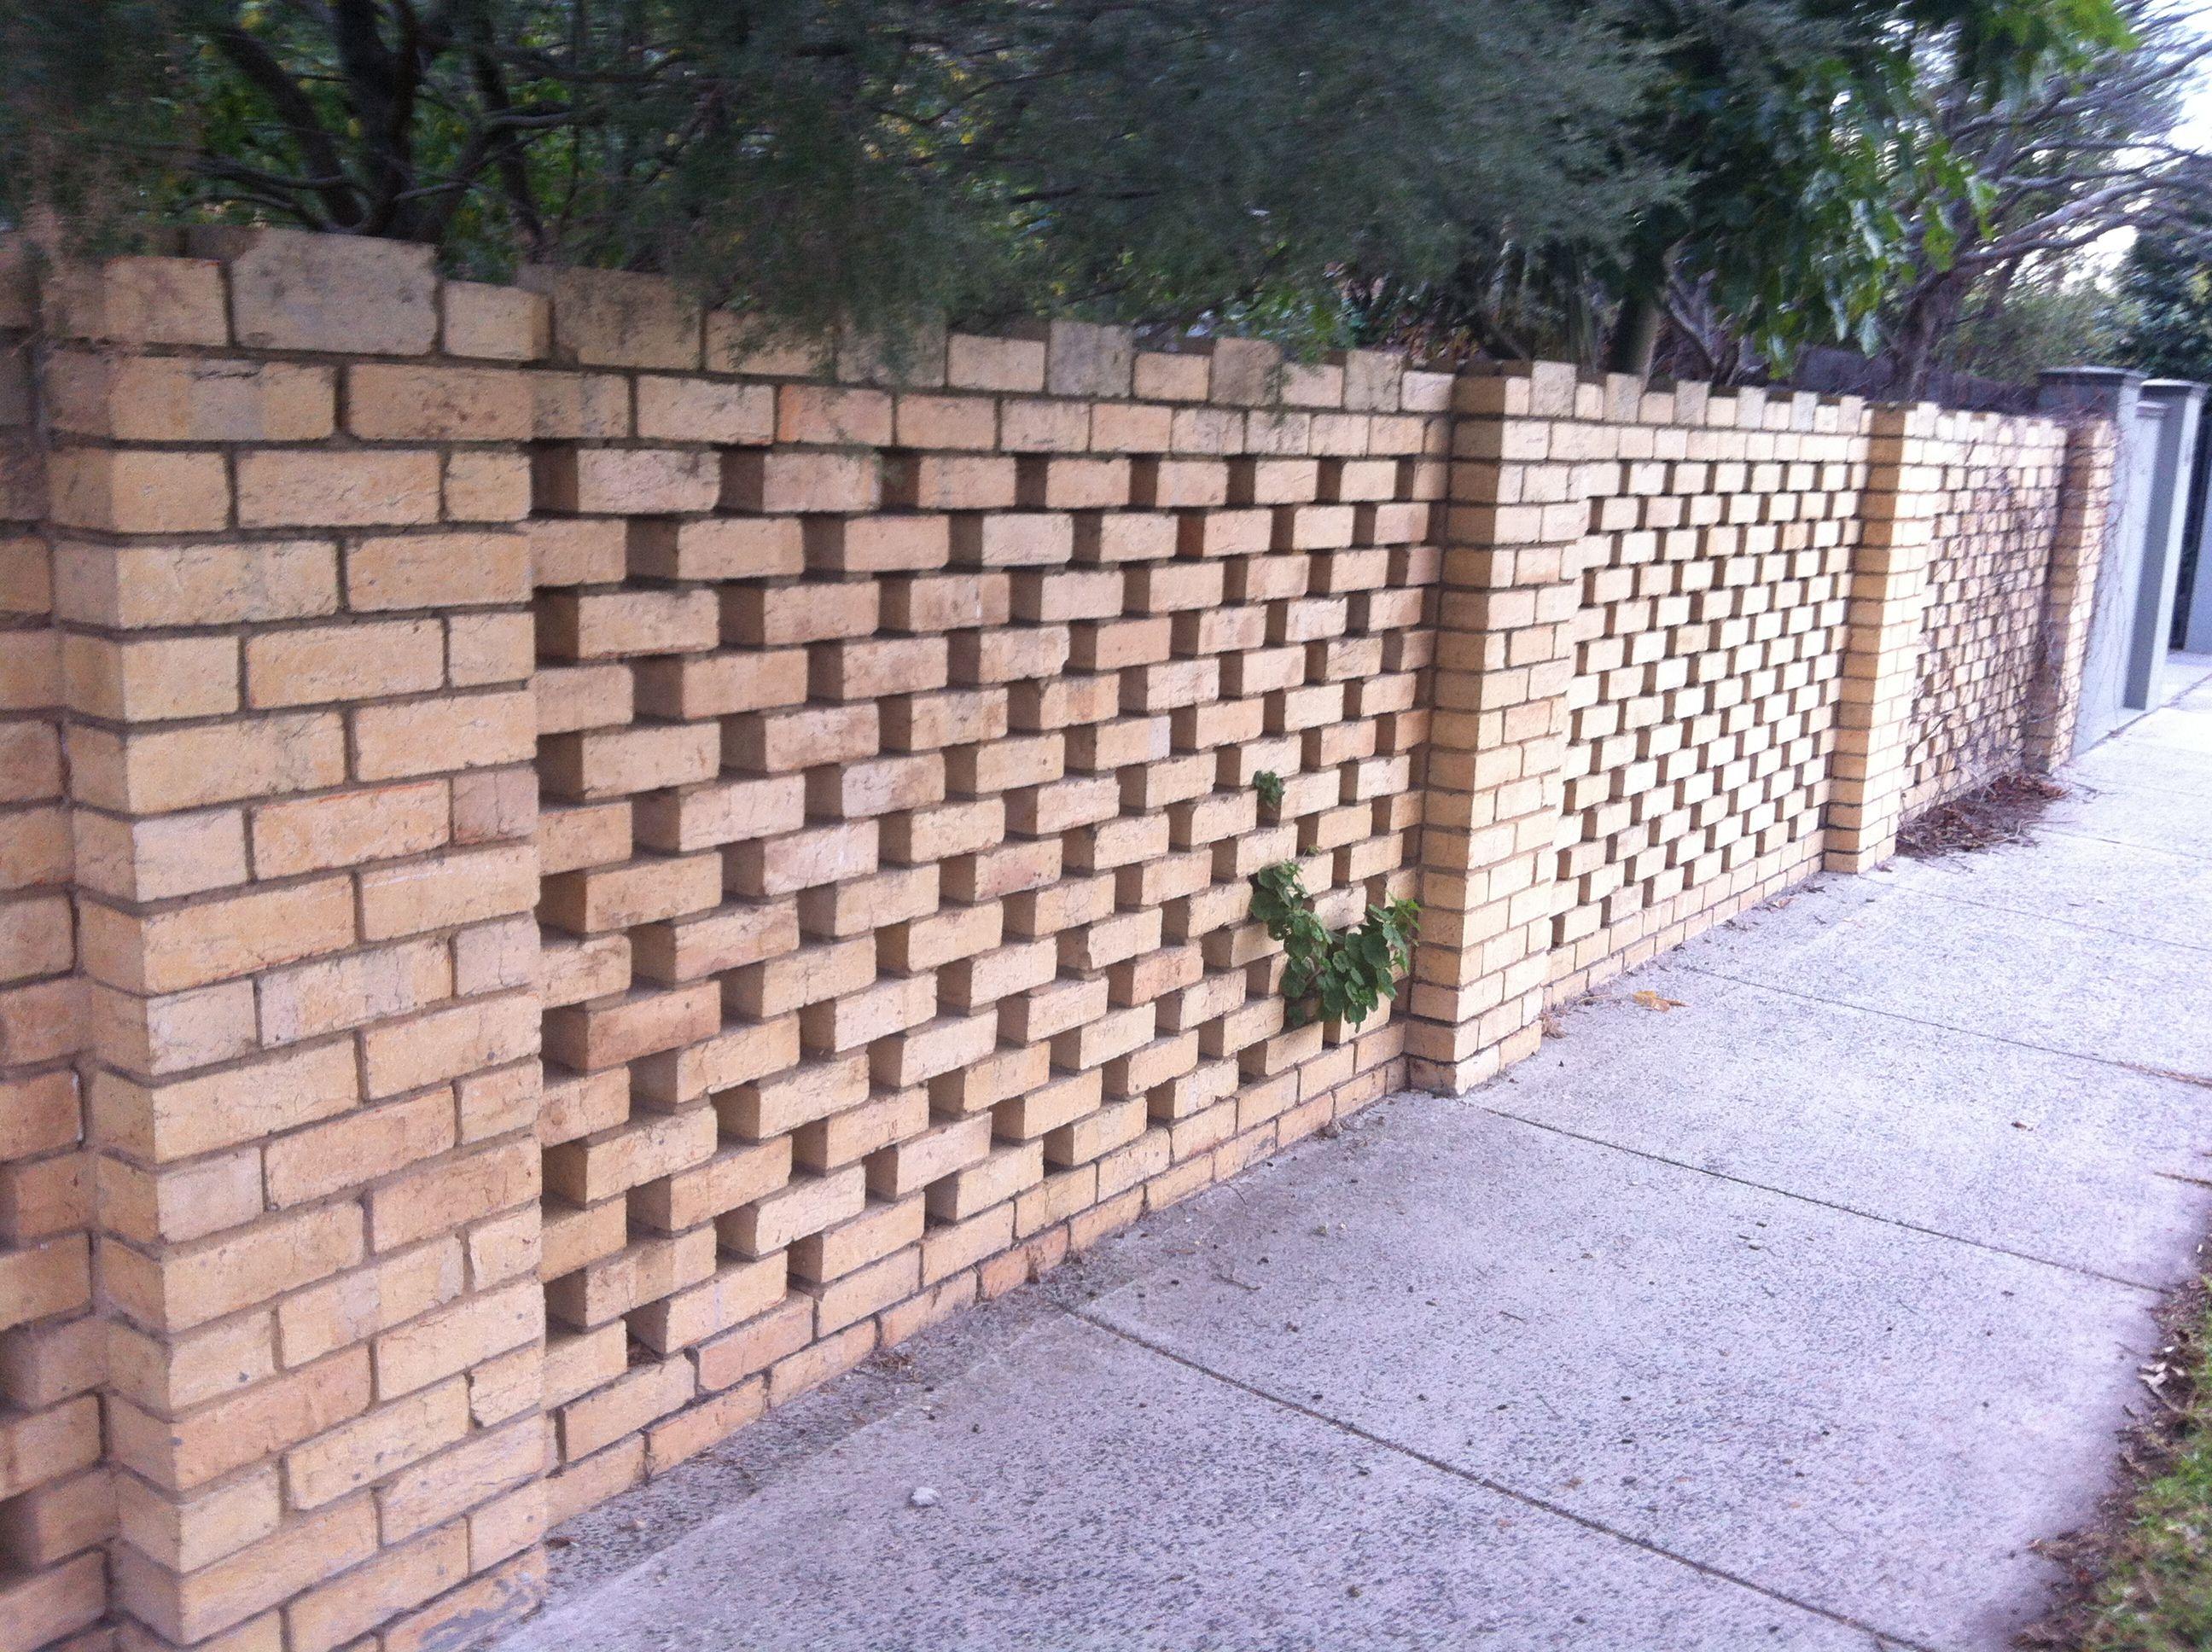 Fencing Idea Staggered Bricks As Alternative To Breezeblocks